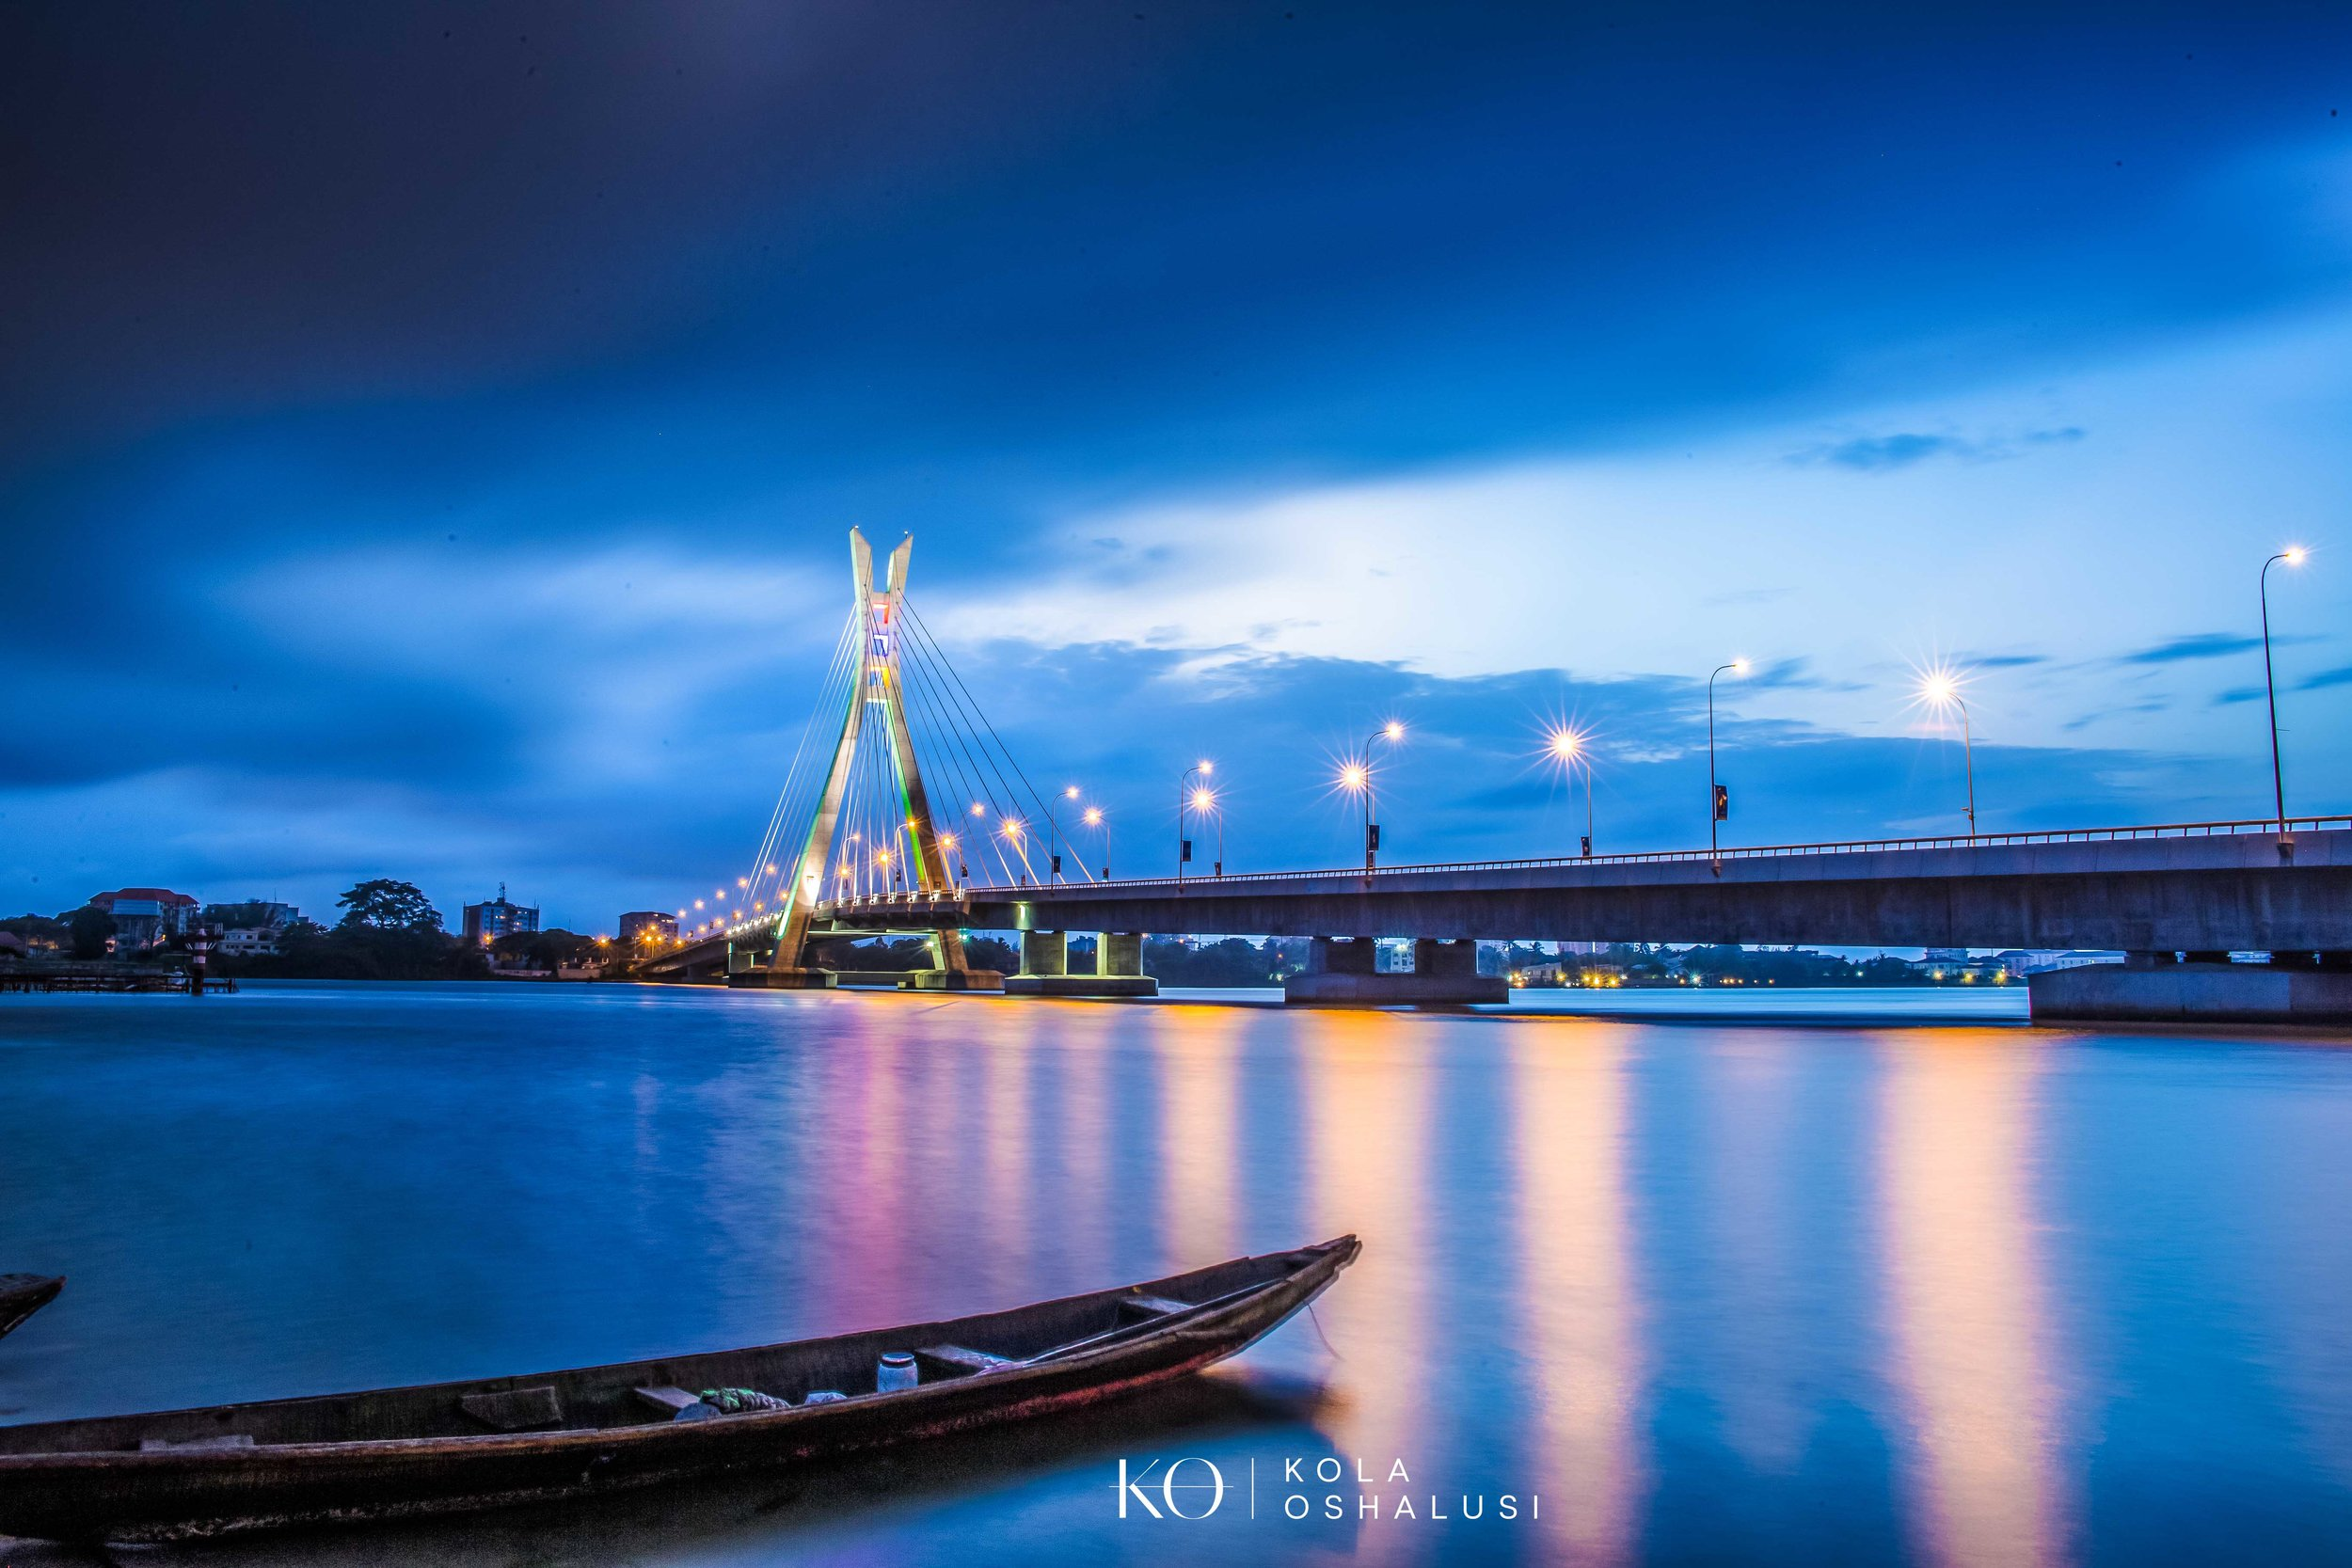 Lekki+ikoyi+bridge+watermark.jpg